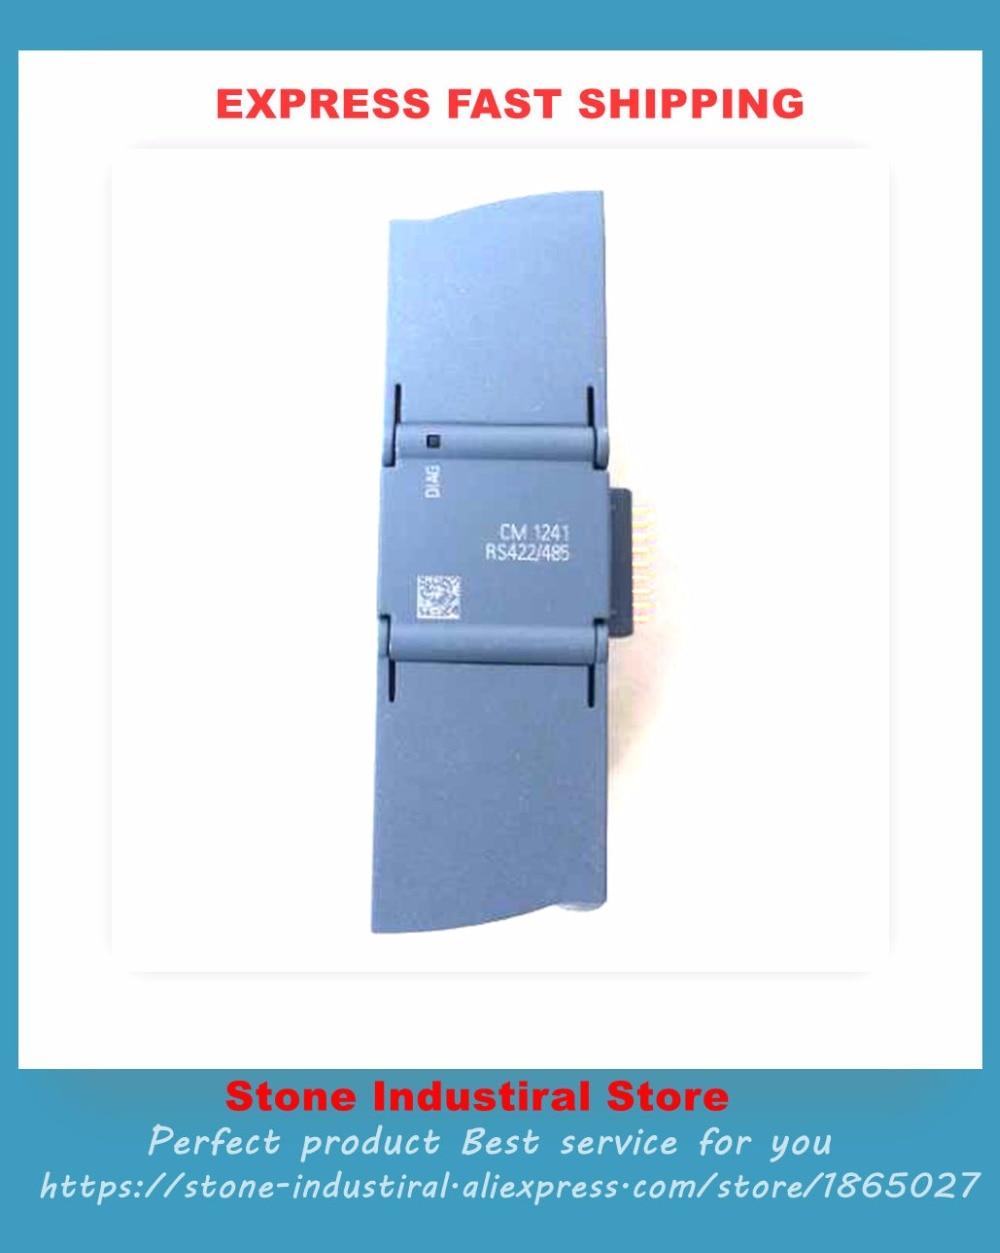 S7 1200 6ES7241 1CH32 0XB0 new original PLC boxed 1 year warranty